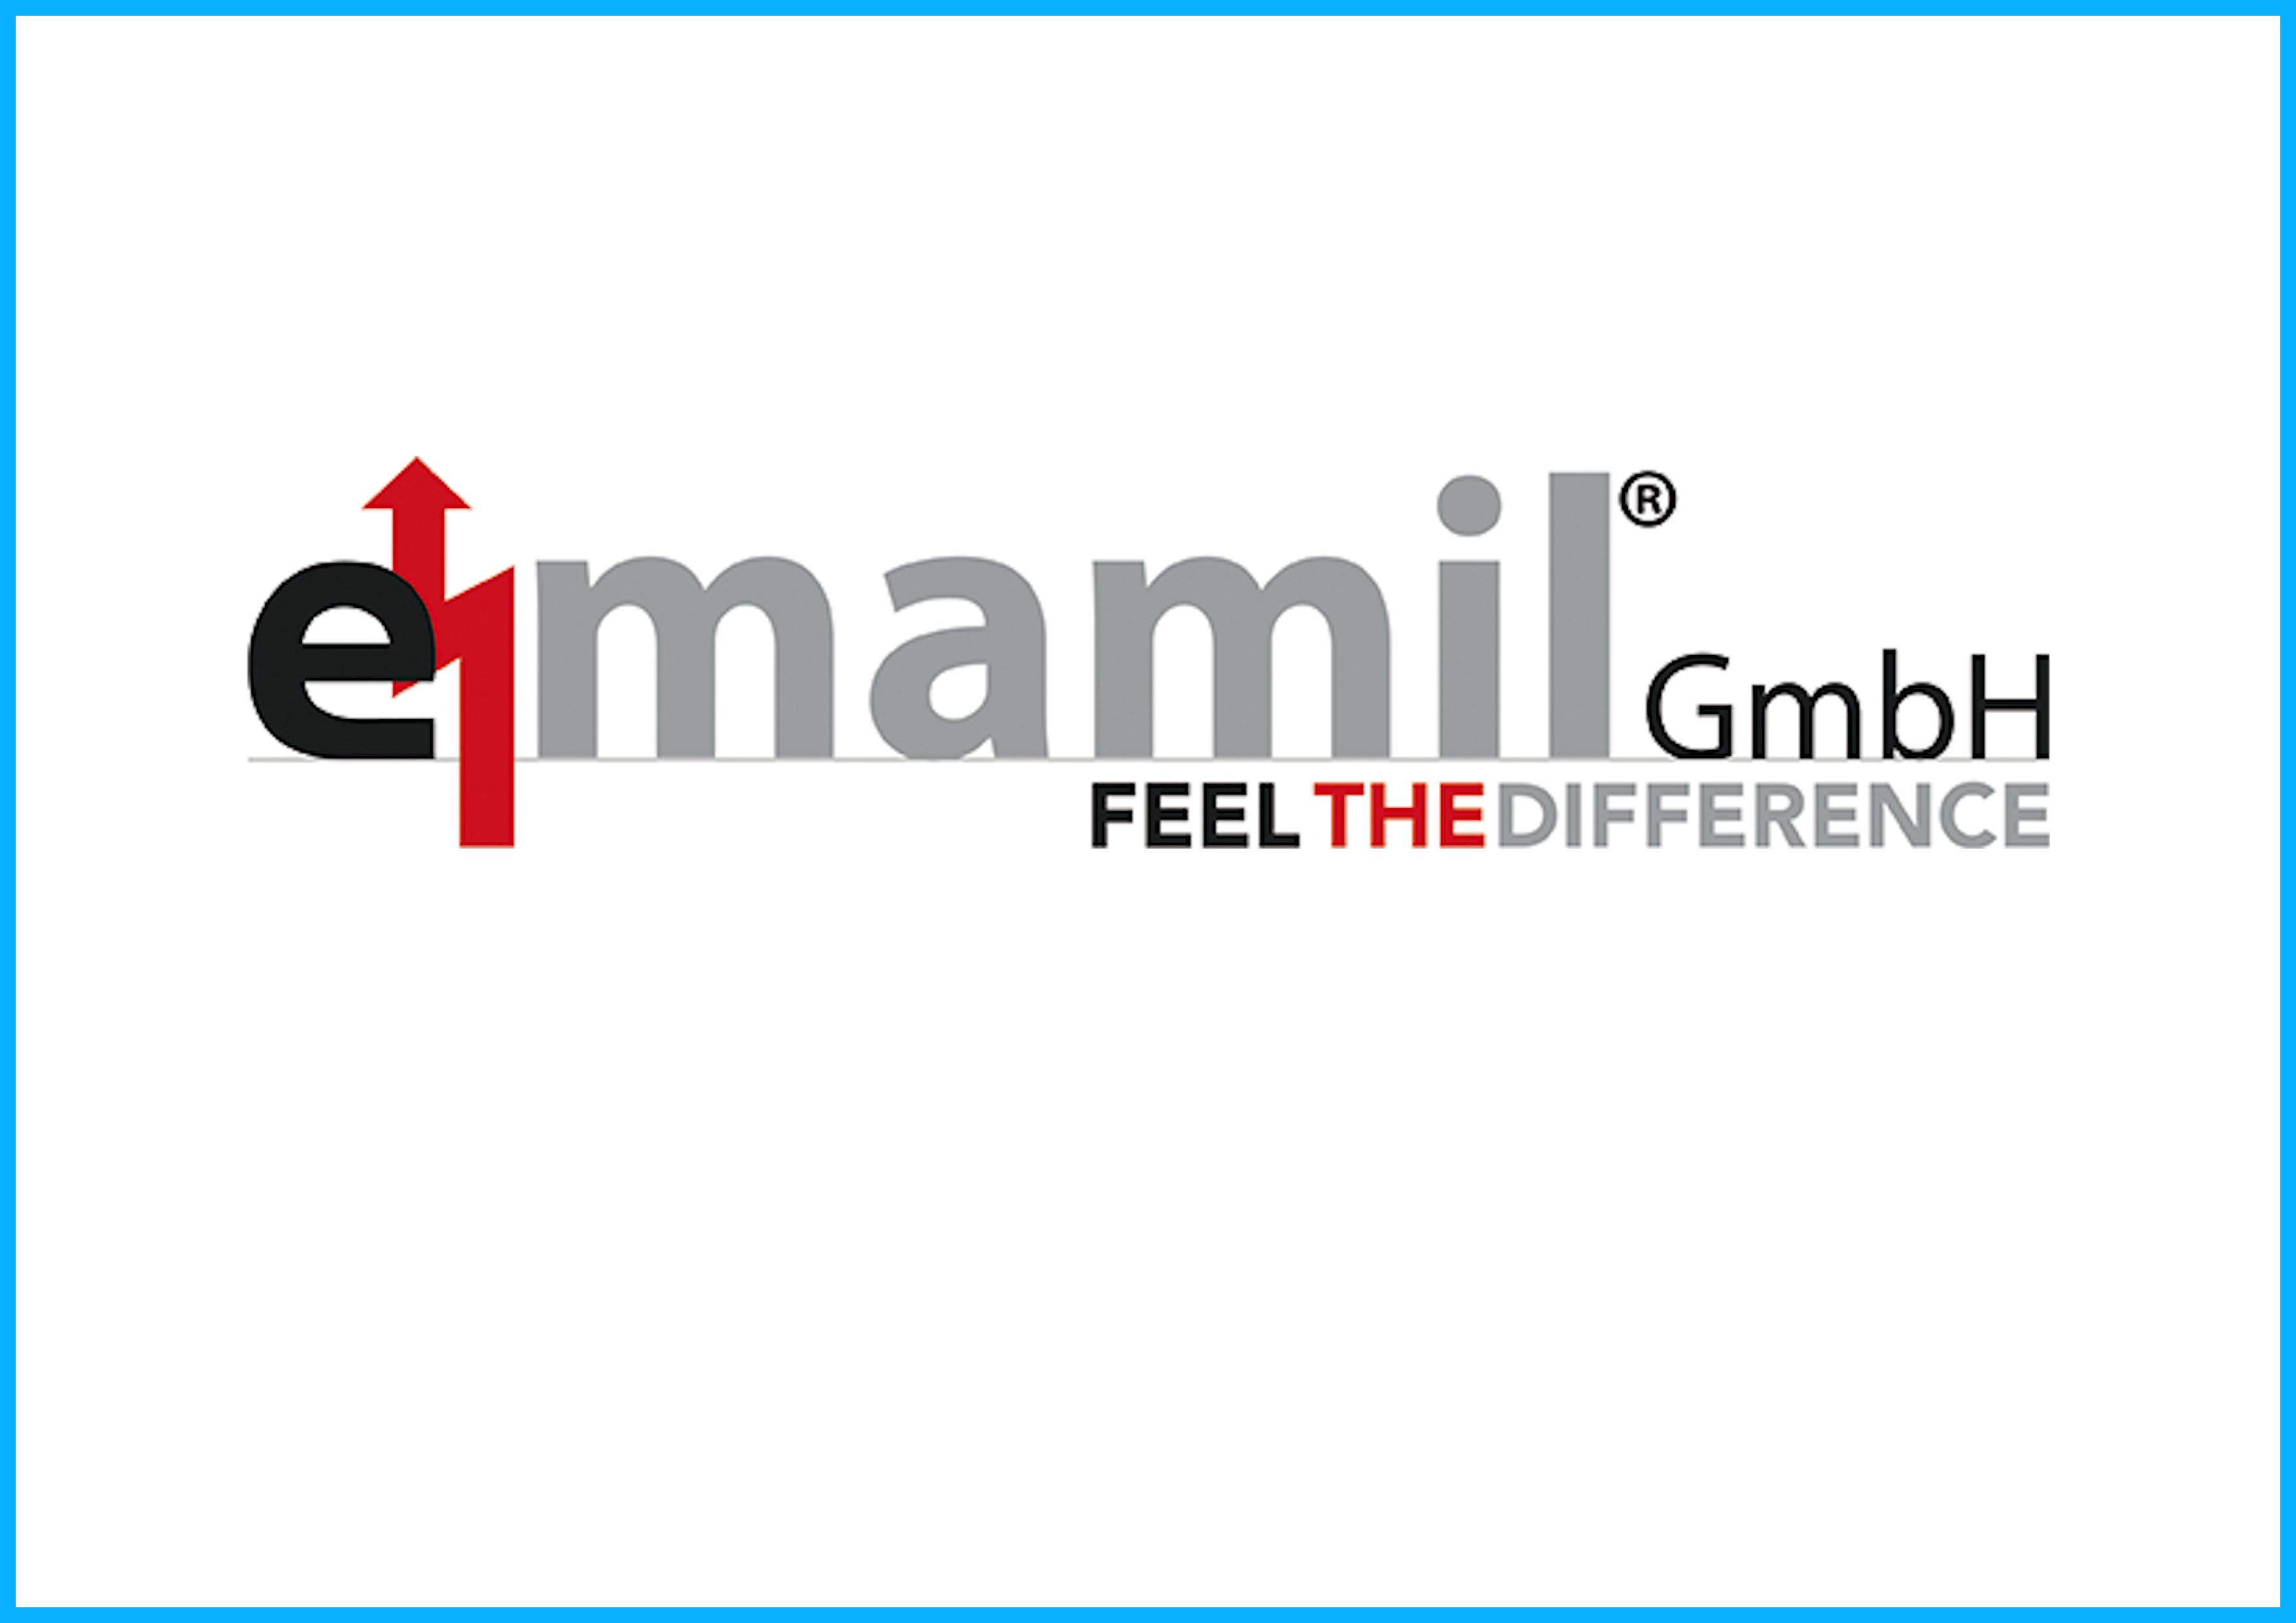 Emamil GmbH